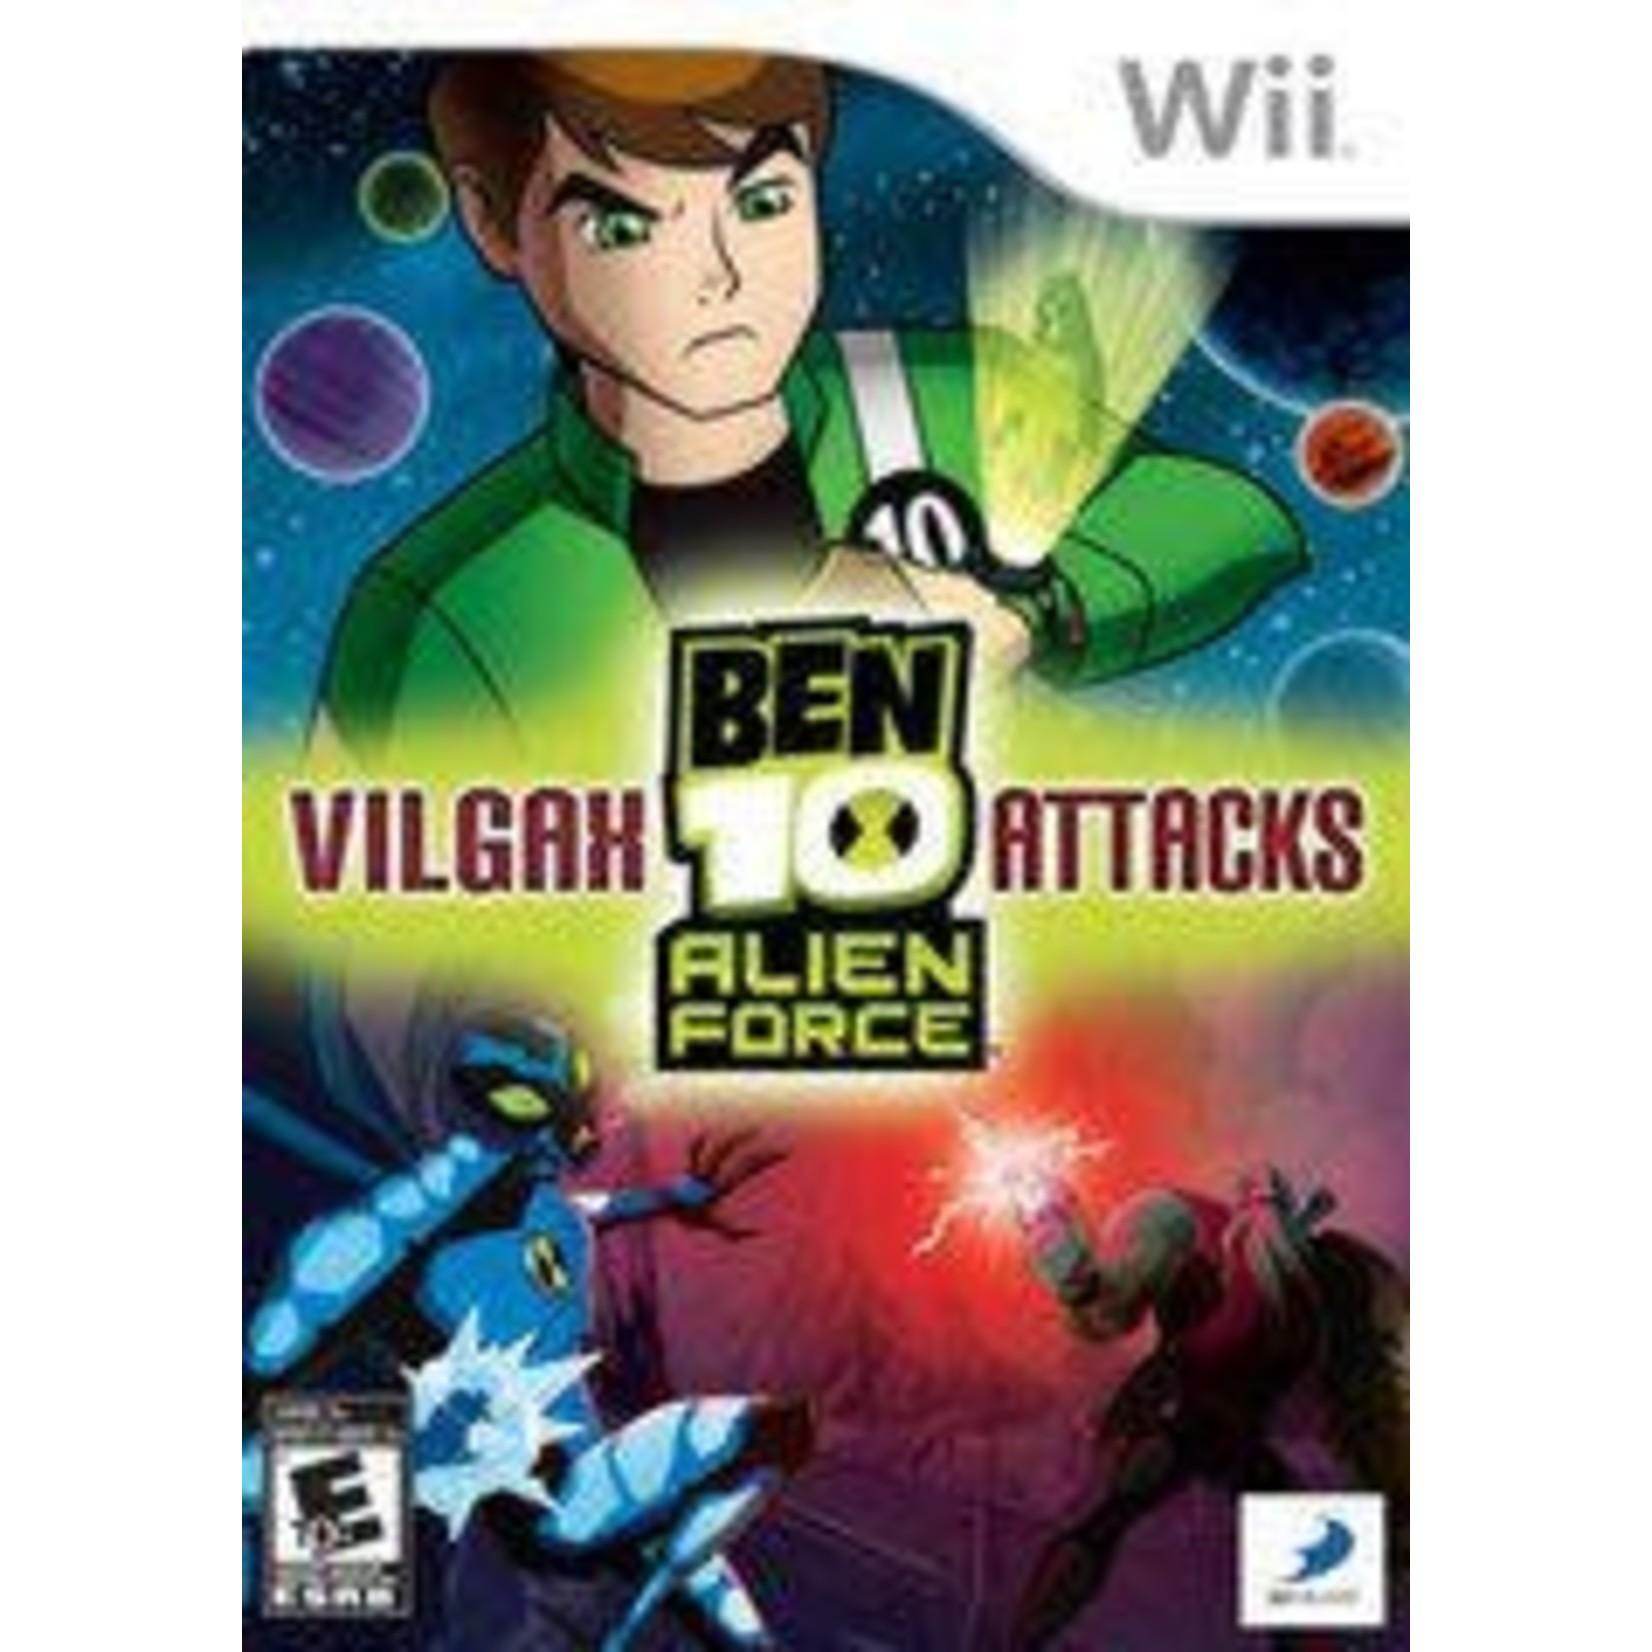 wiiusd-Ben 10 Alien Force Vilgax Attacks